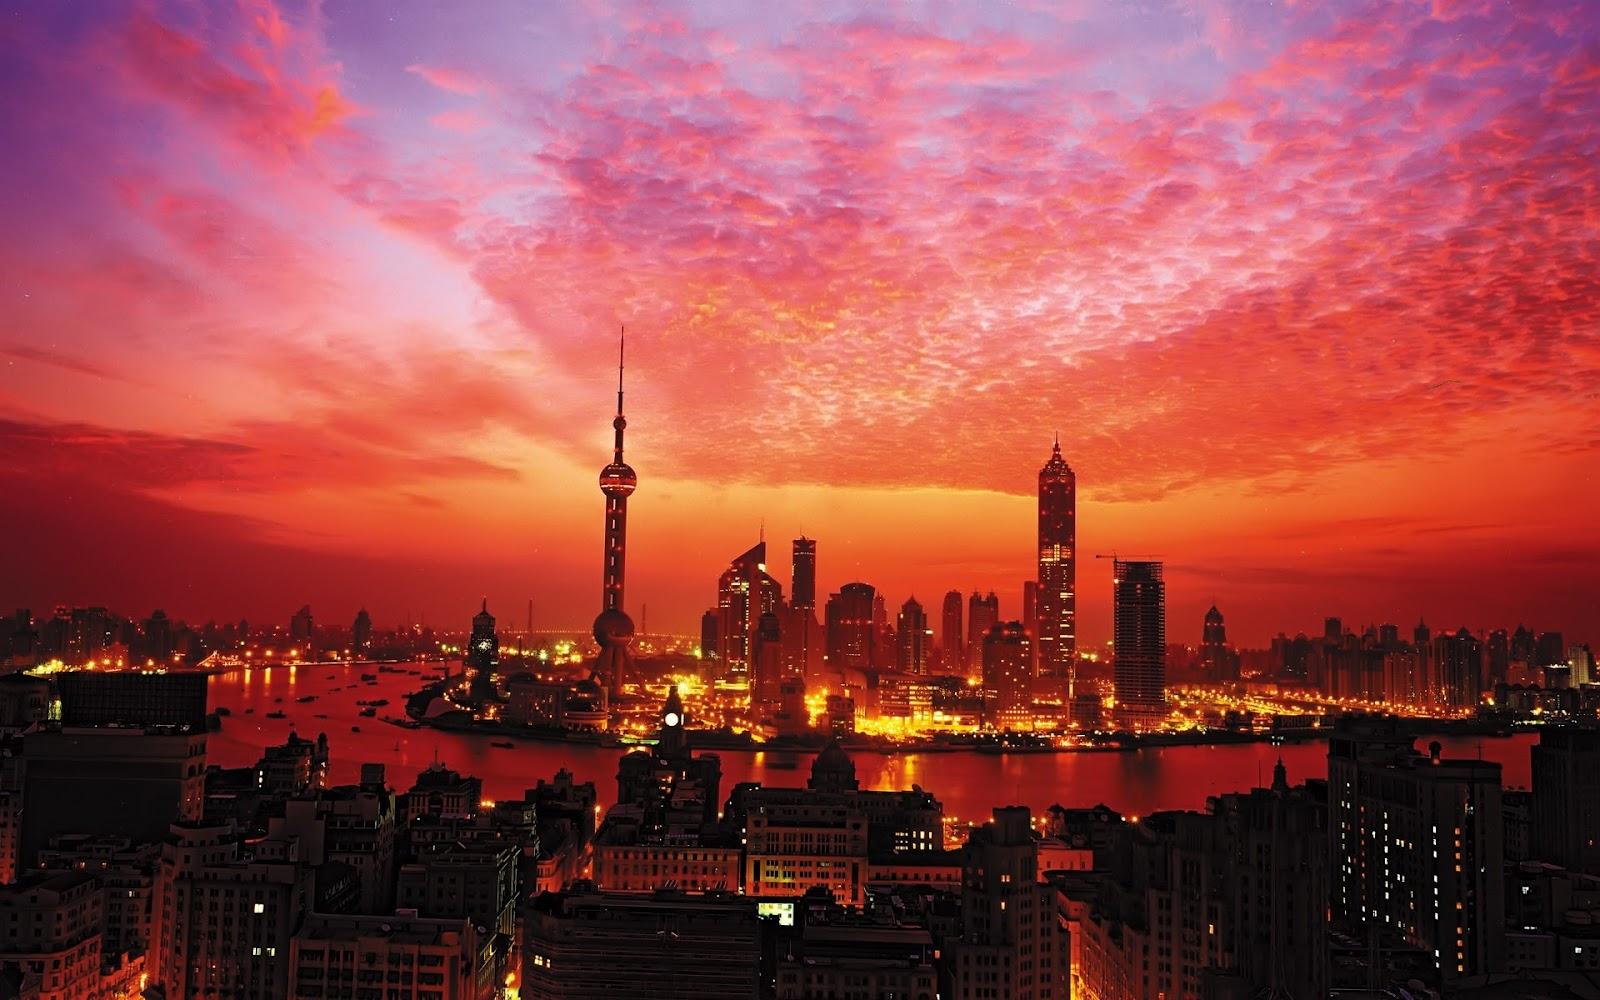 http://2.bp.blogspot.com/-ubnTRfzrIAU/T9qGXTI7A_I/AAAAAAAAfP8/CihGt4_bokU/s1600/Shanghai-China-Atardecer_Imagenes-de-Ciudades.jpg